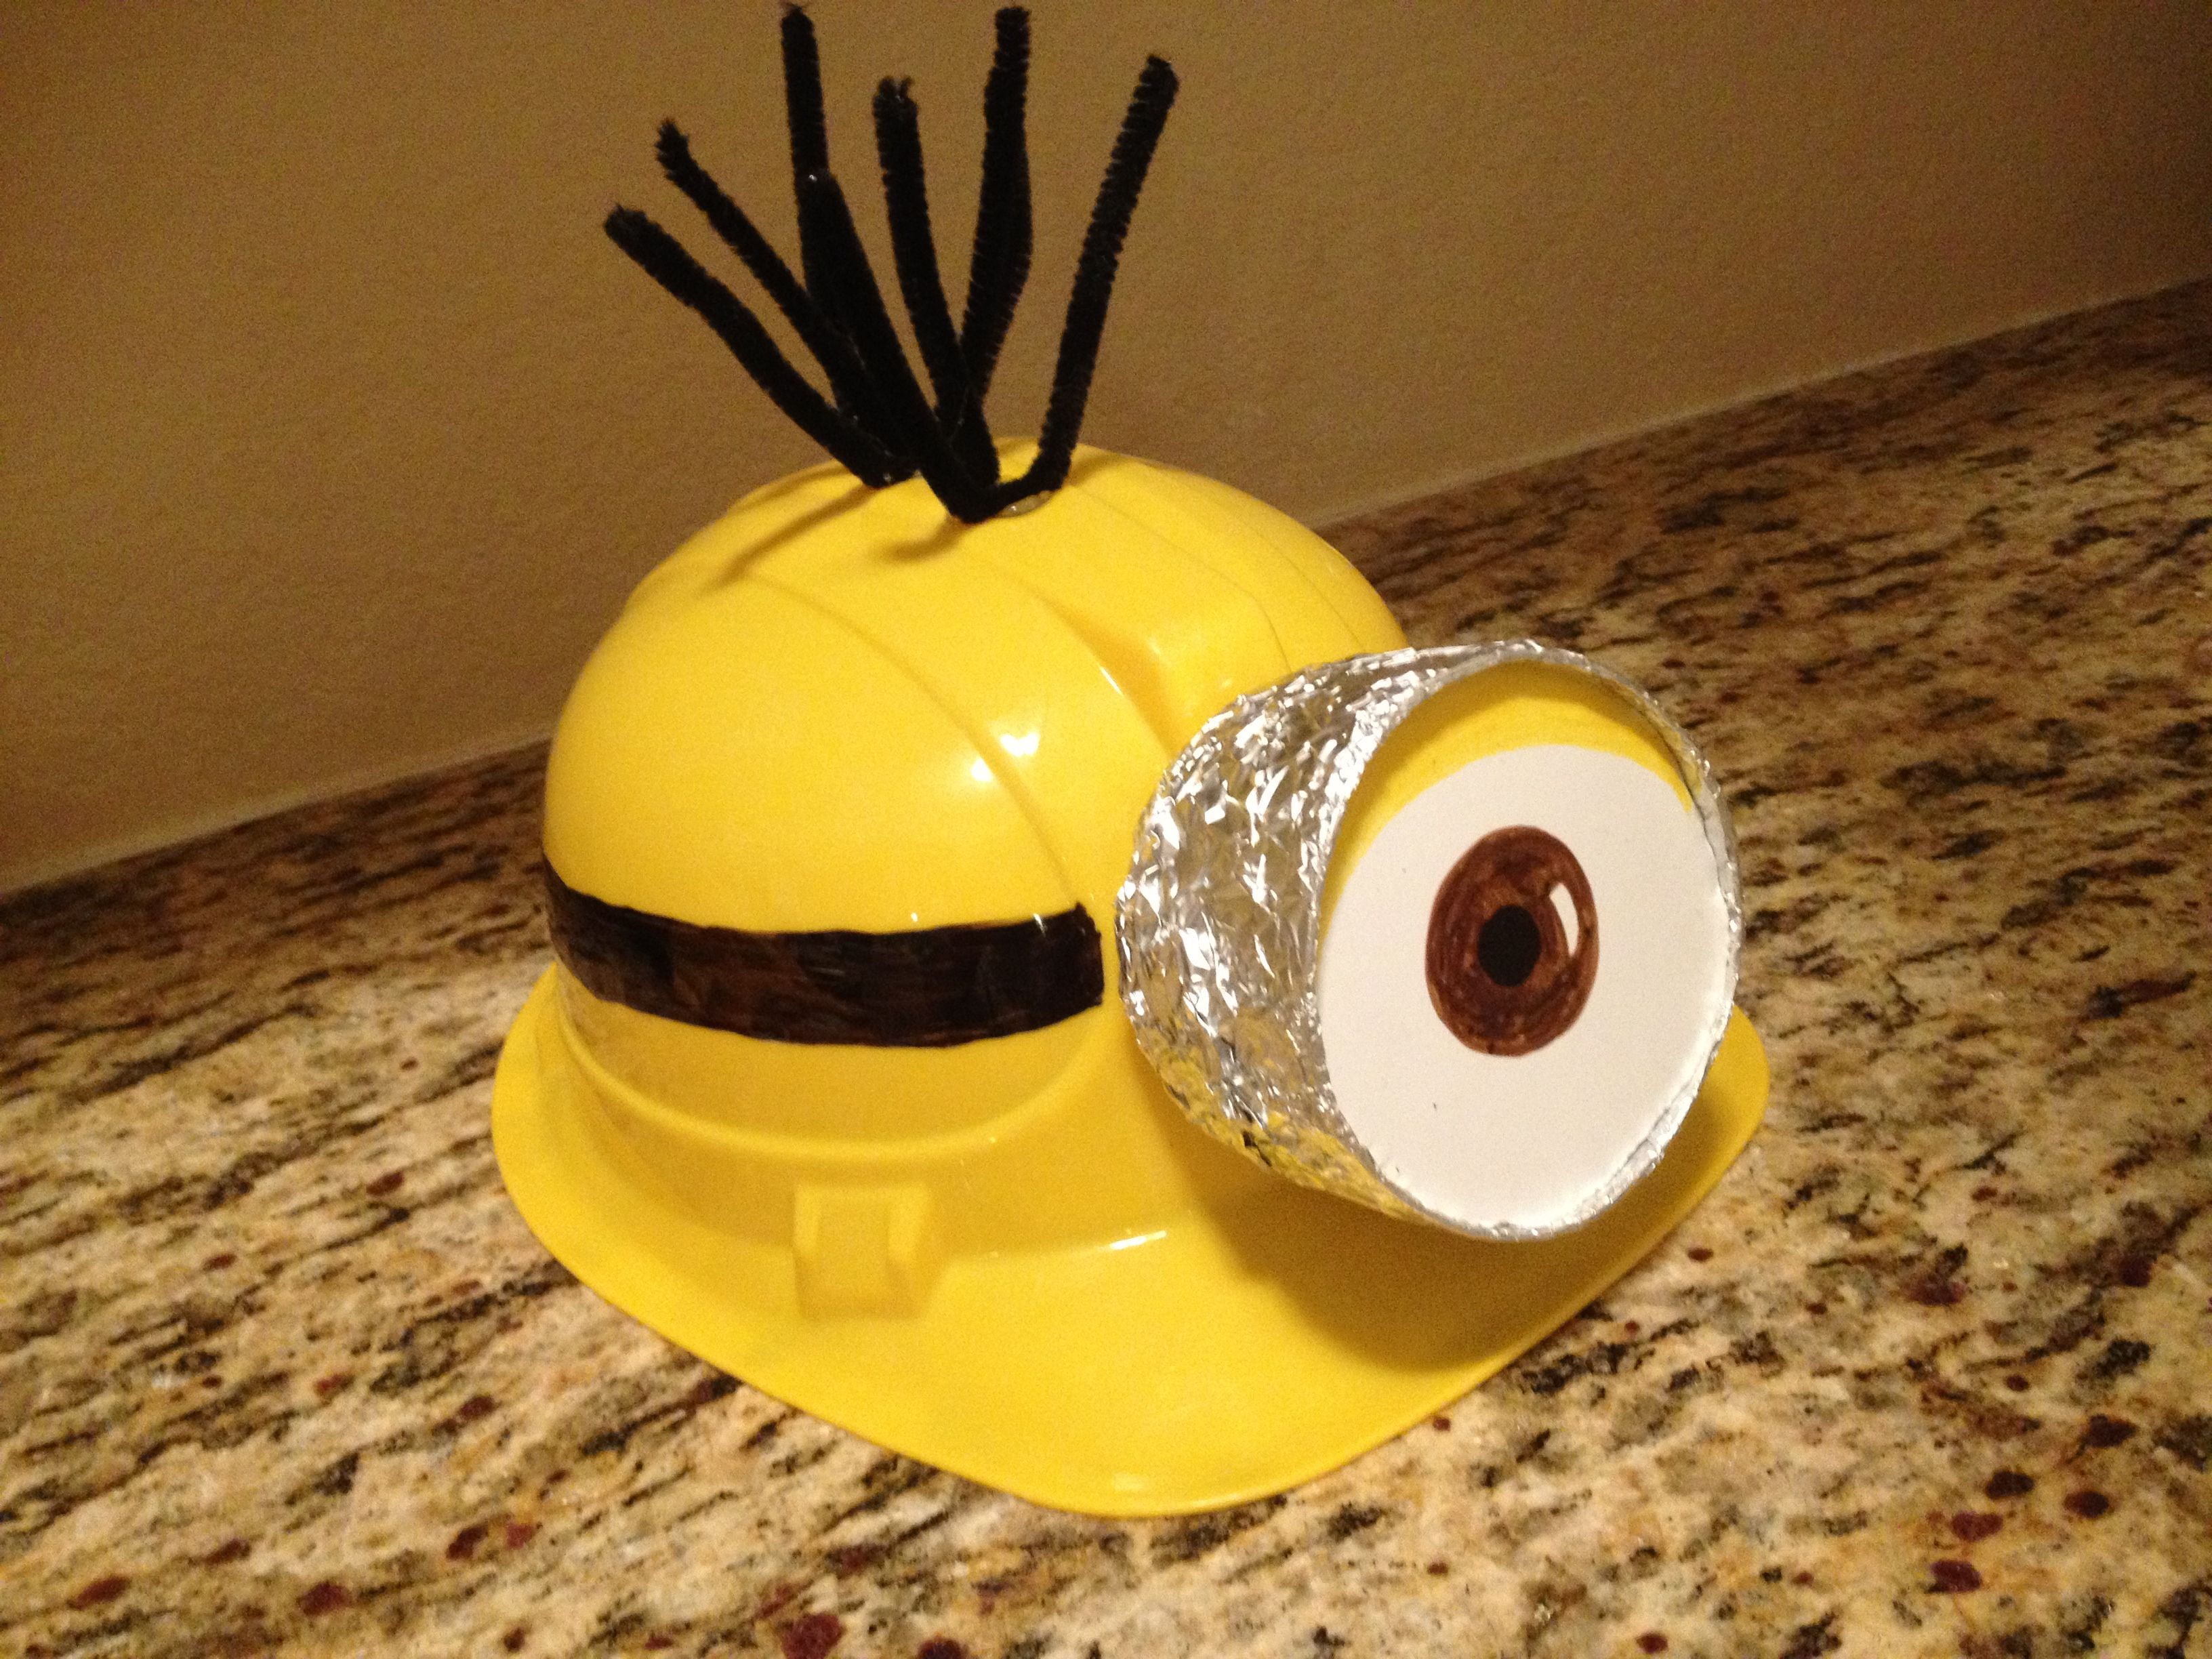 DIY minion hat for costume. Despicable me yellow minion